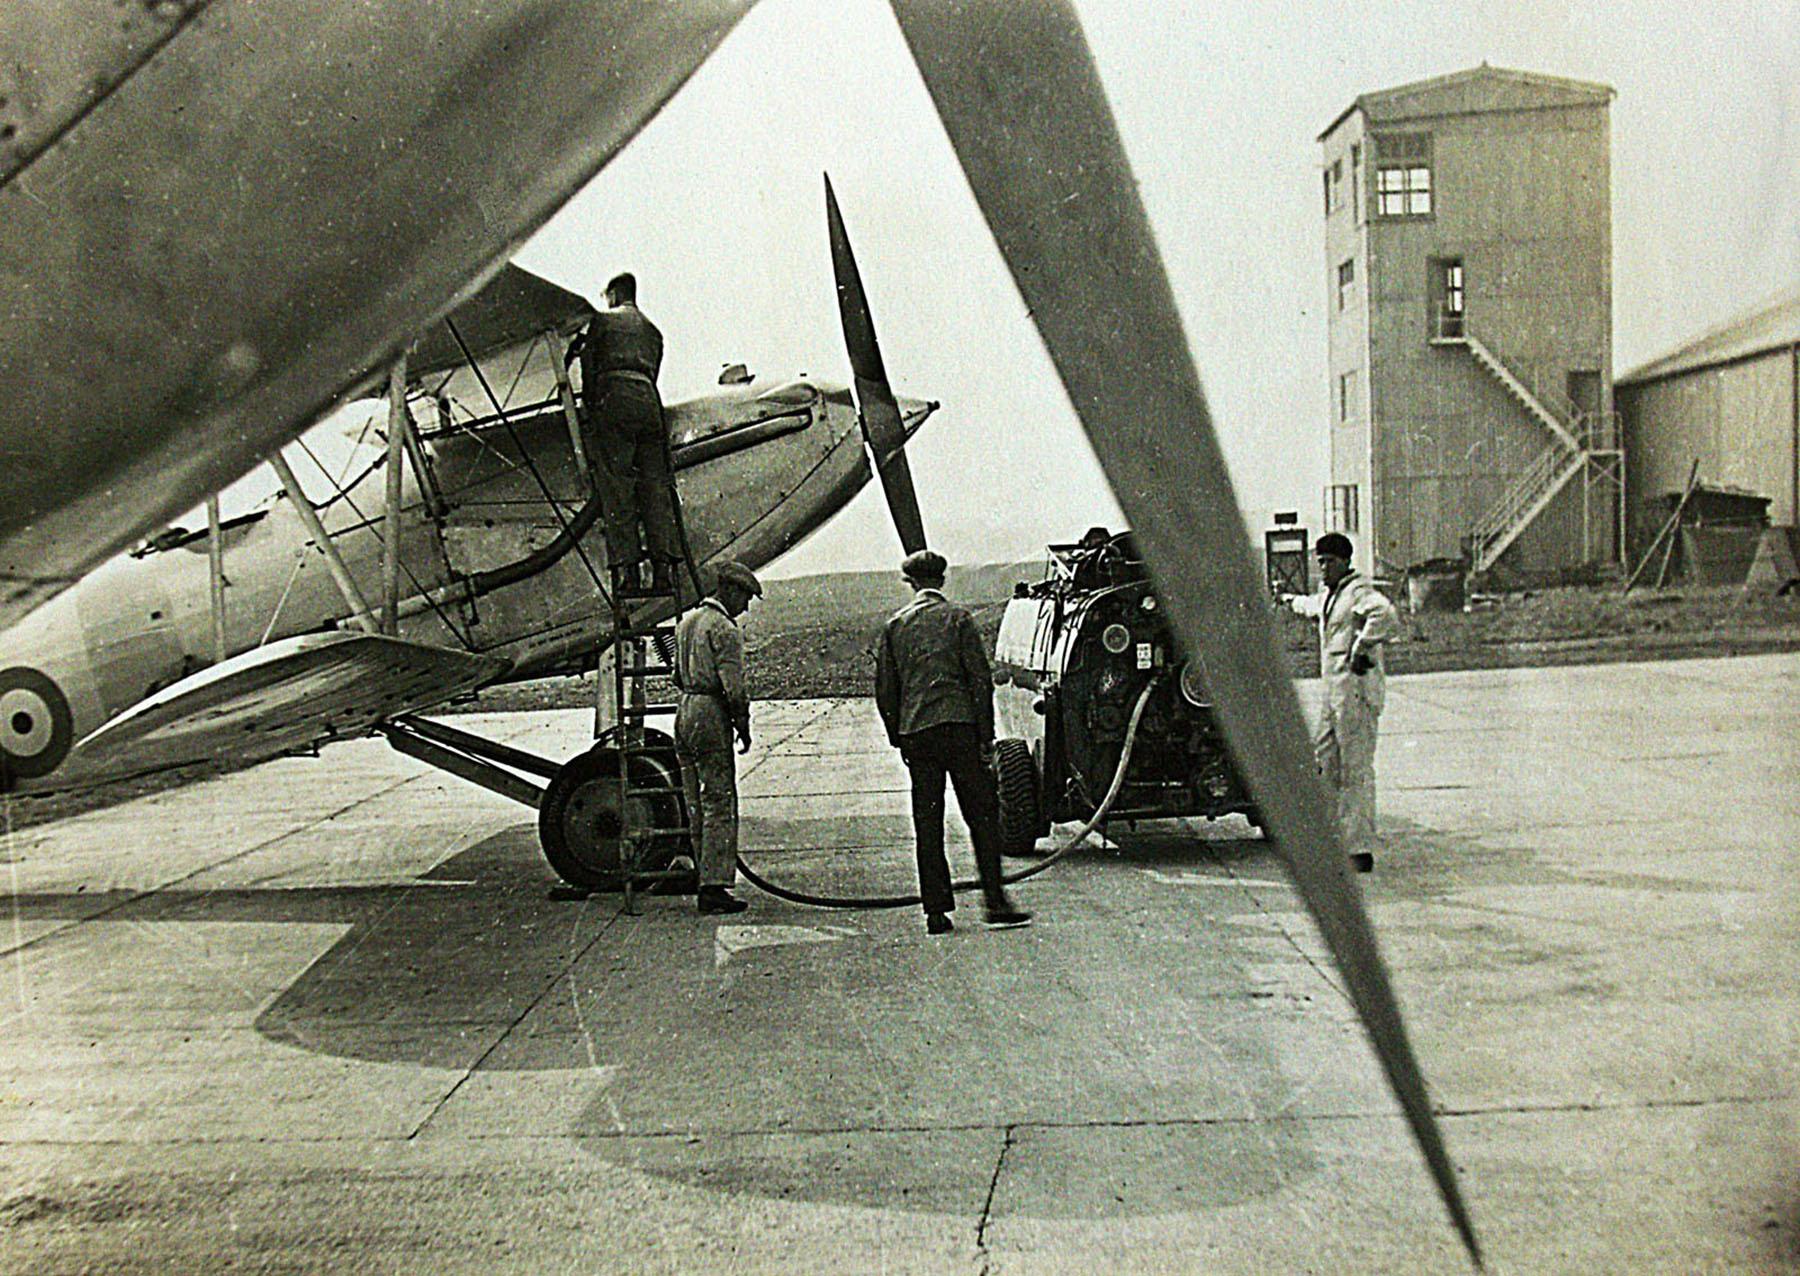 Hawker Hart T RAF trainer refueling photo taken by Patrick Hayes KIA July 7 1940 01